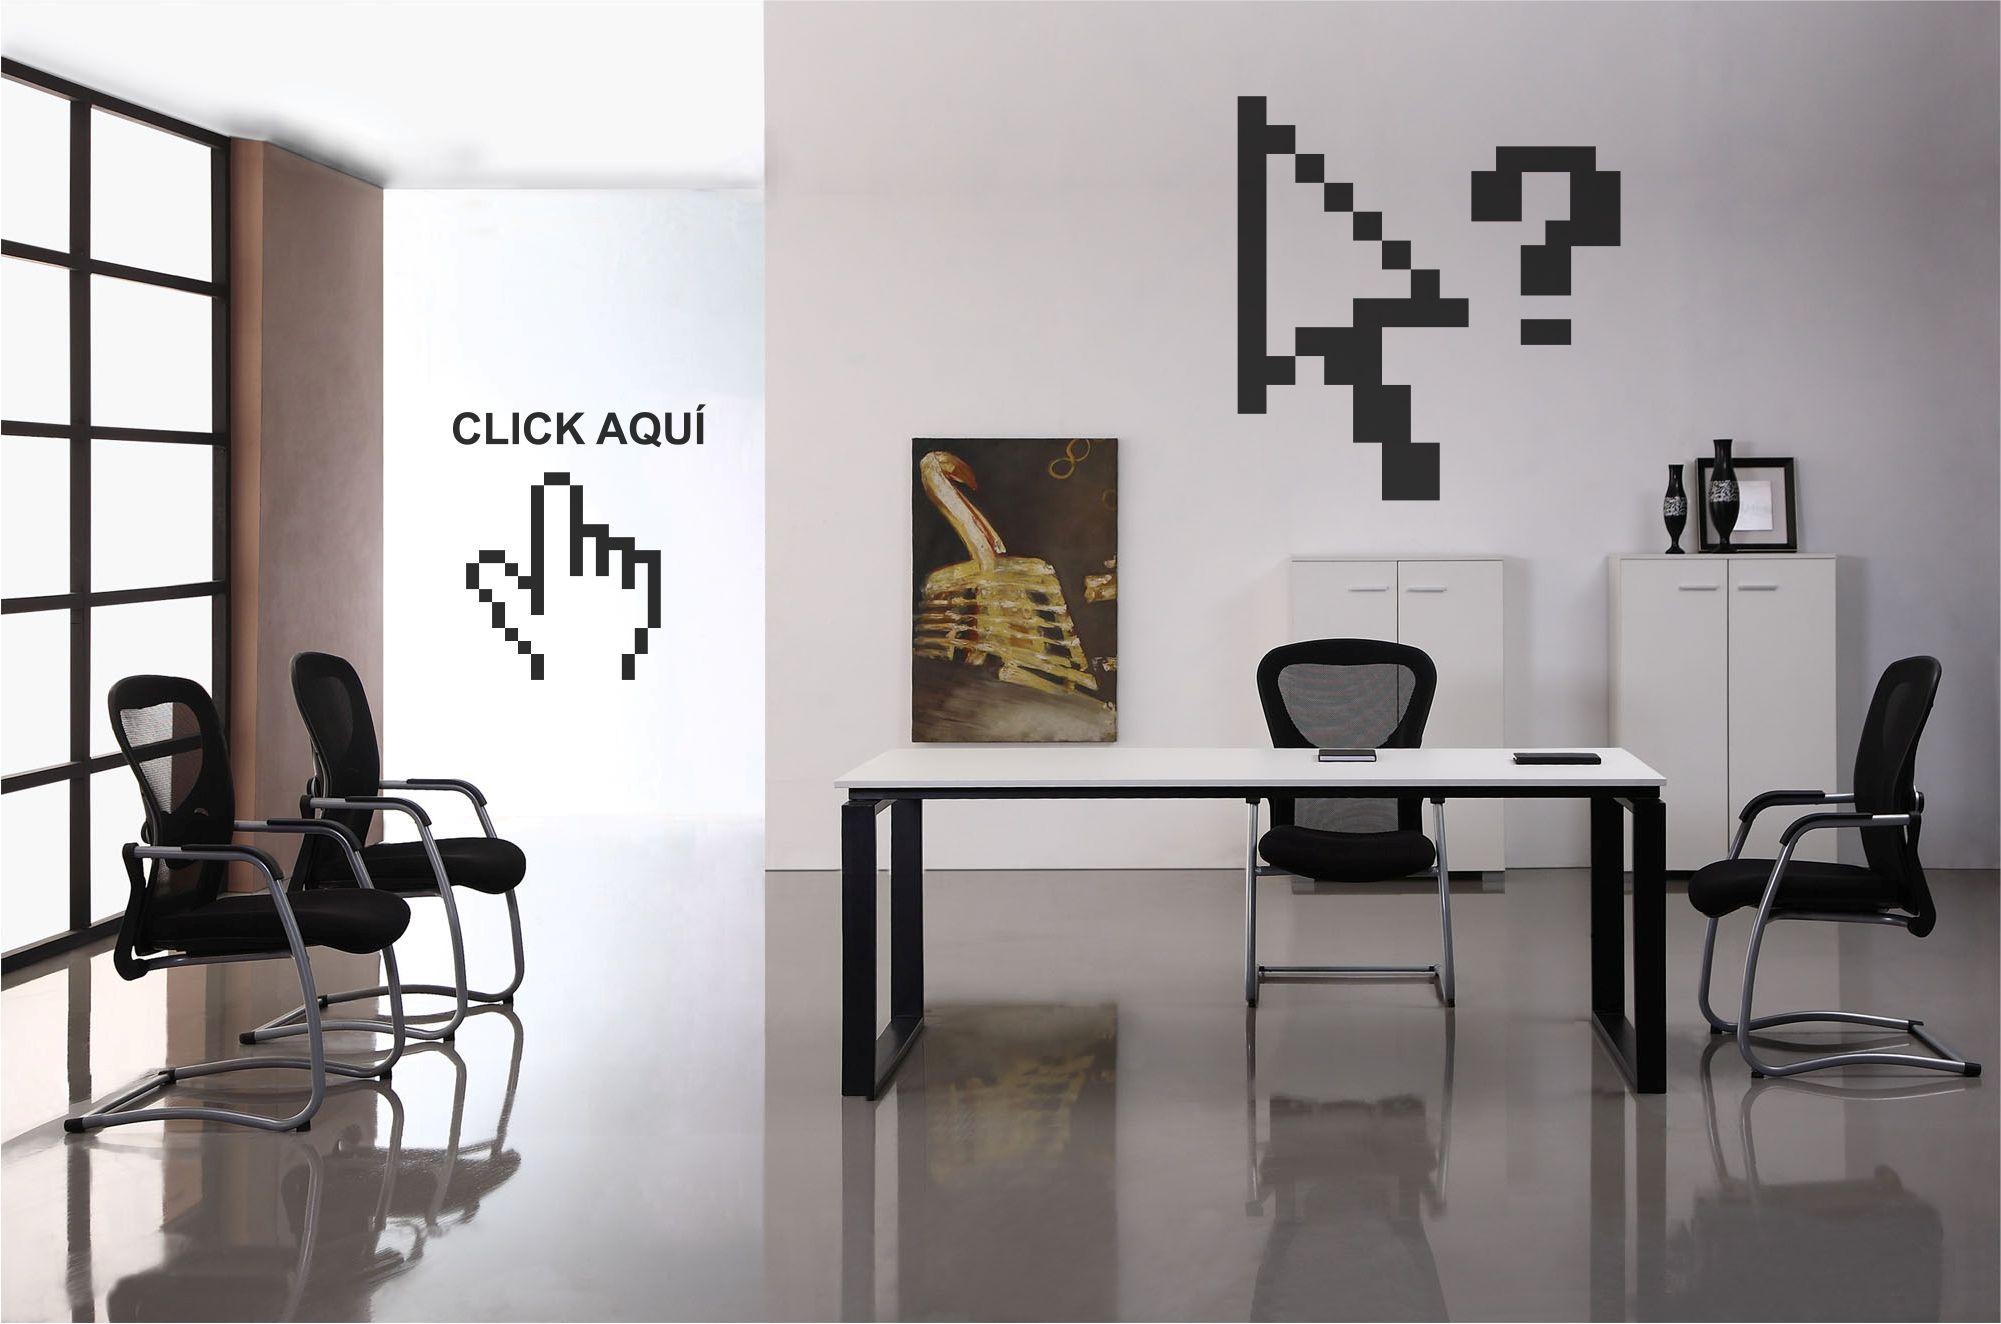 Decora tu oficinablog de vinilos decorativos for Decora tu oficina